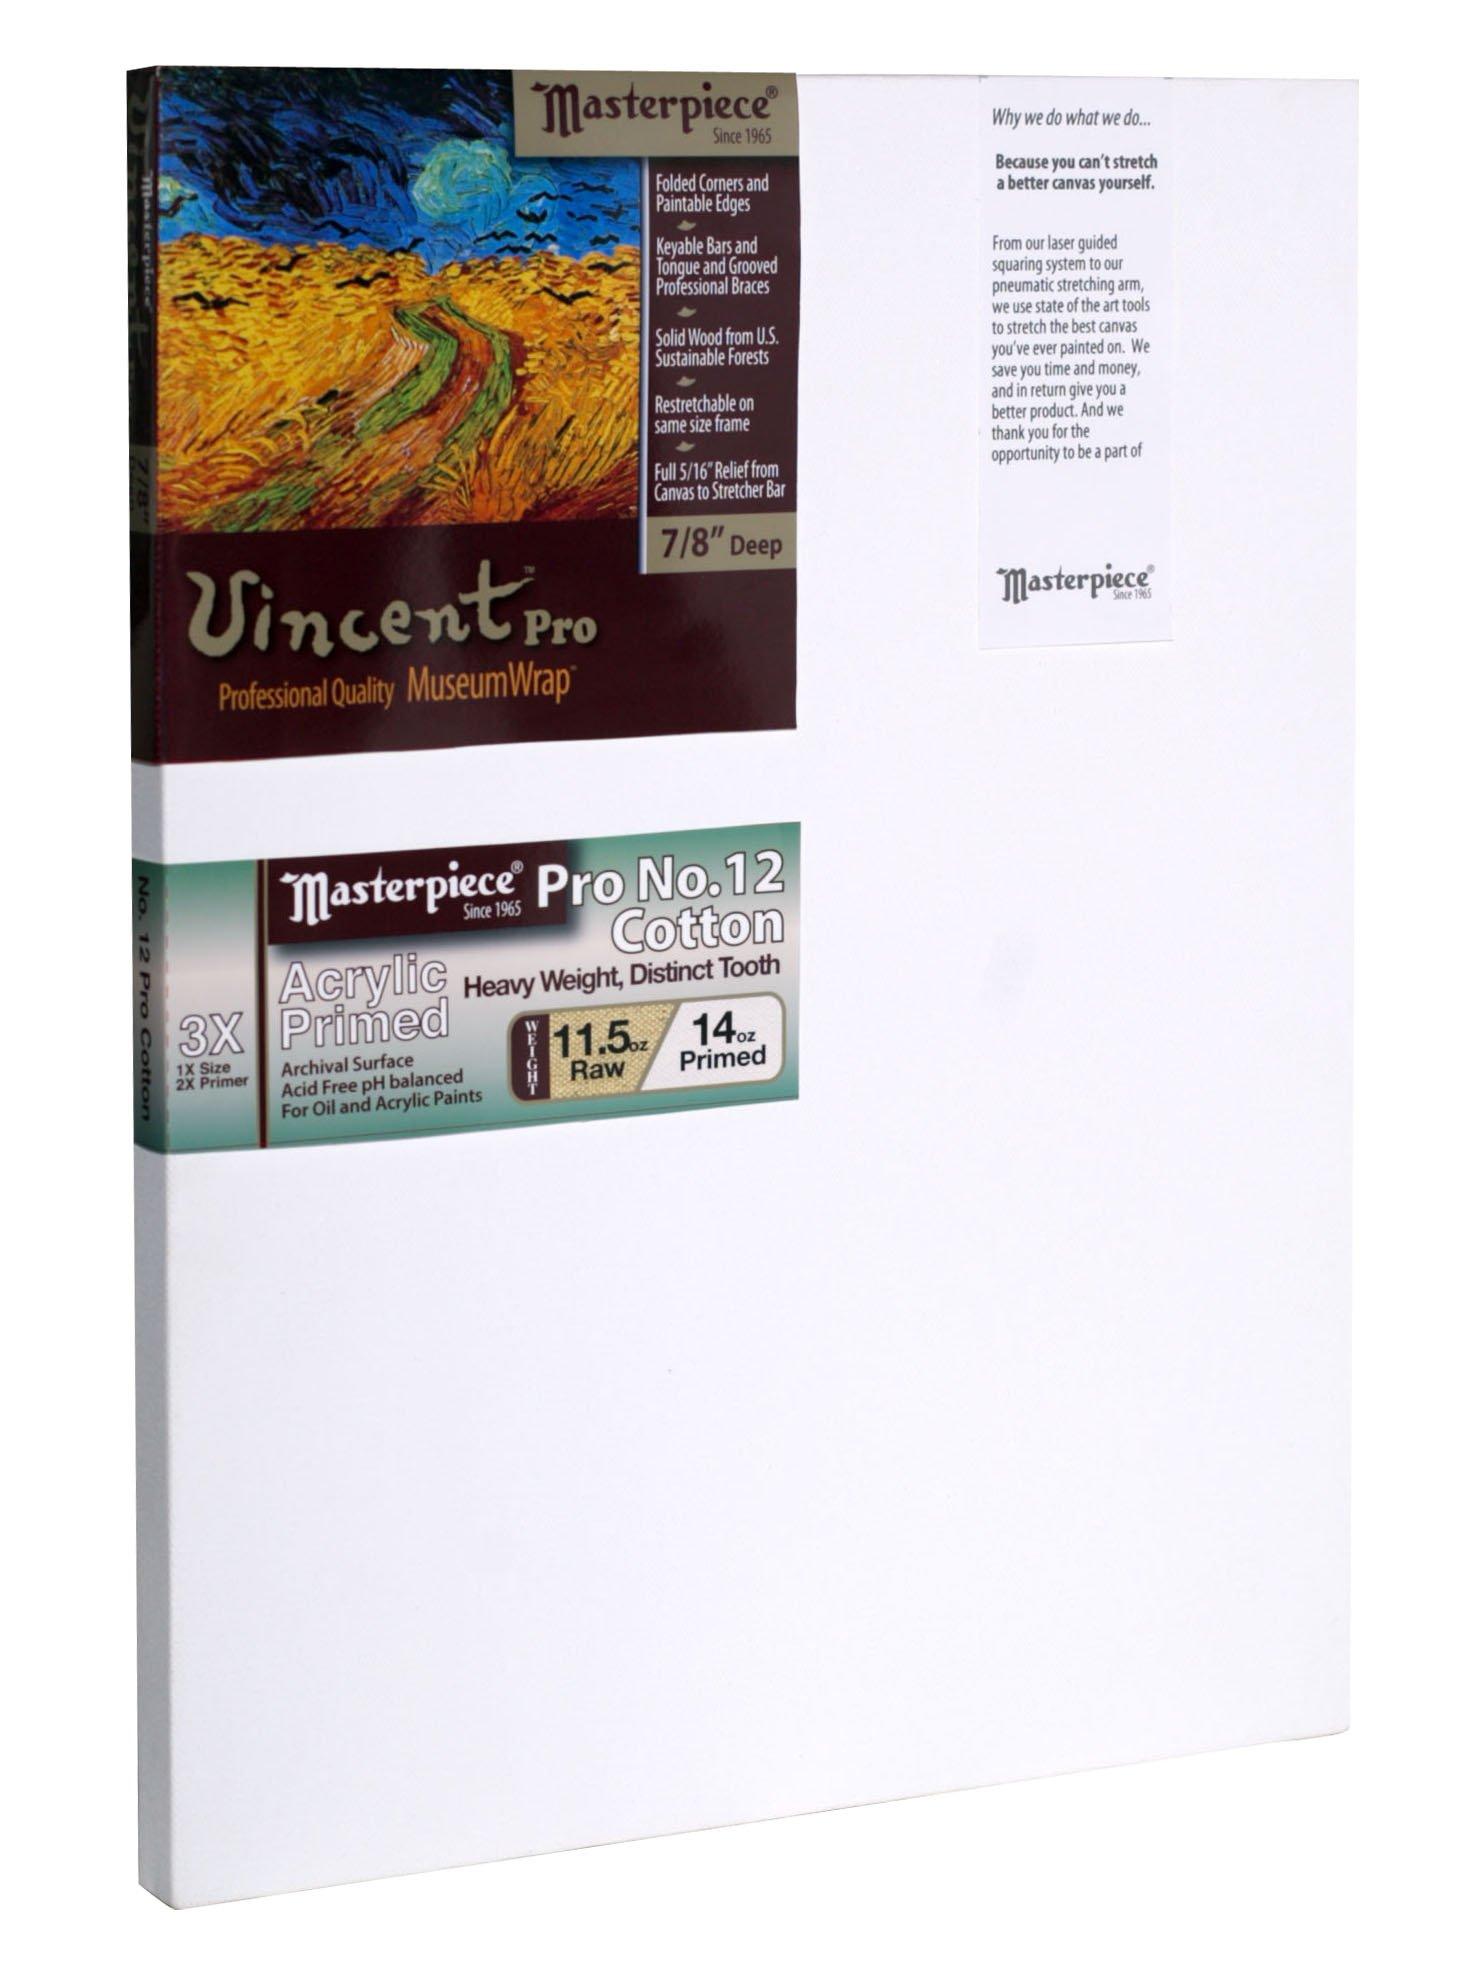 Masterpiece Artist Canvas 41869 Vincent PRO 7/8'' Deep, 36'' x 48'', Cotton 14.0oz - 3X - Sausalito Heavy Weight by Masterpiece Artist Canvas